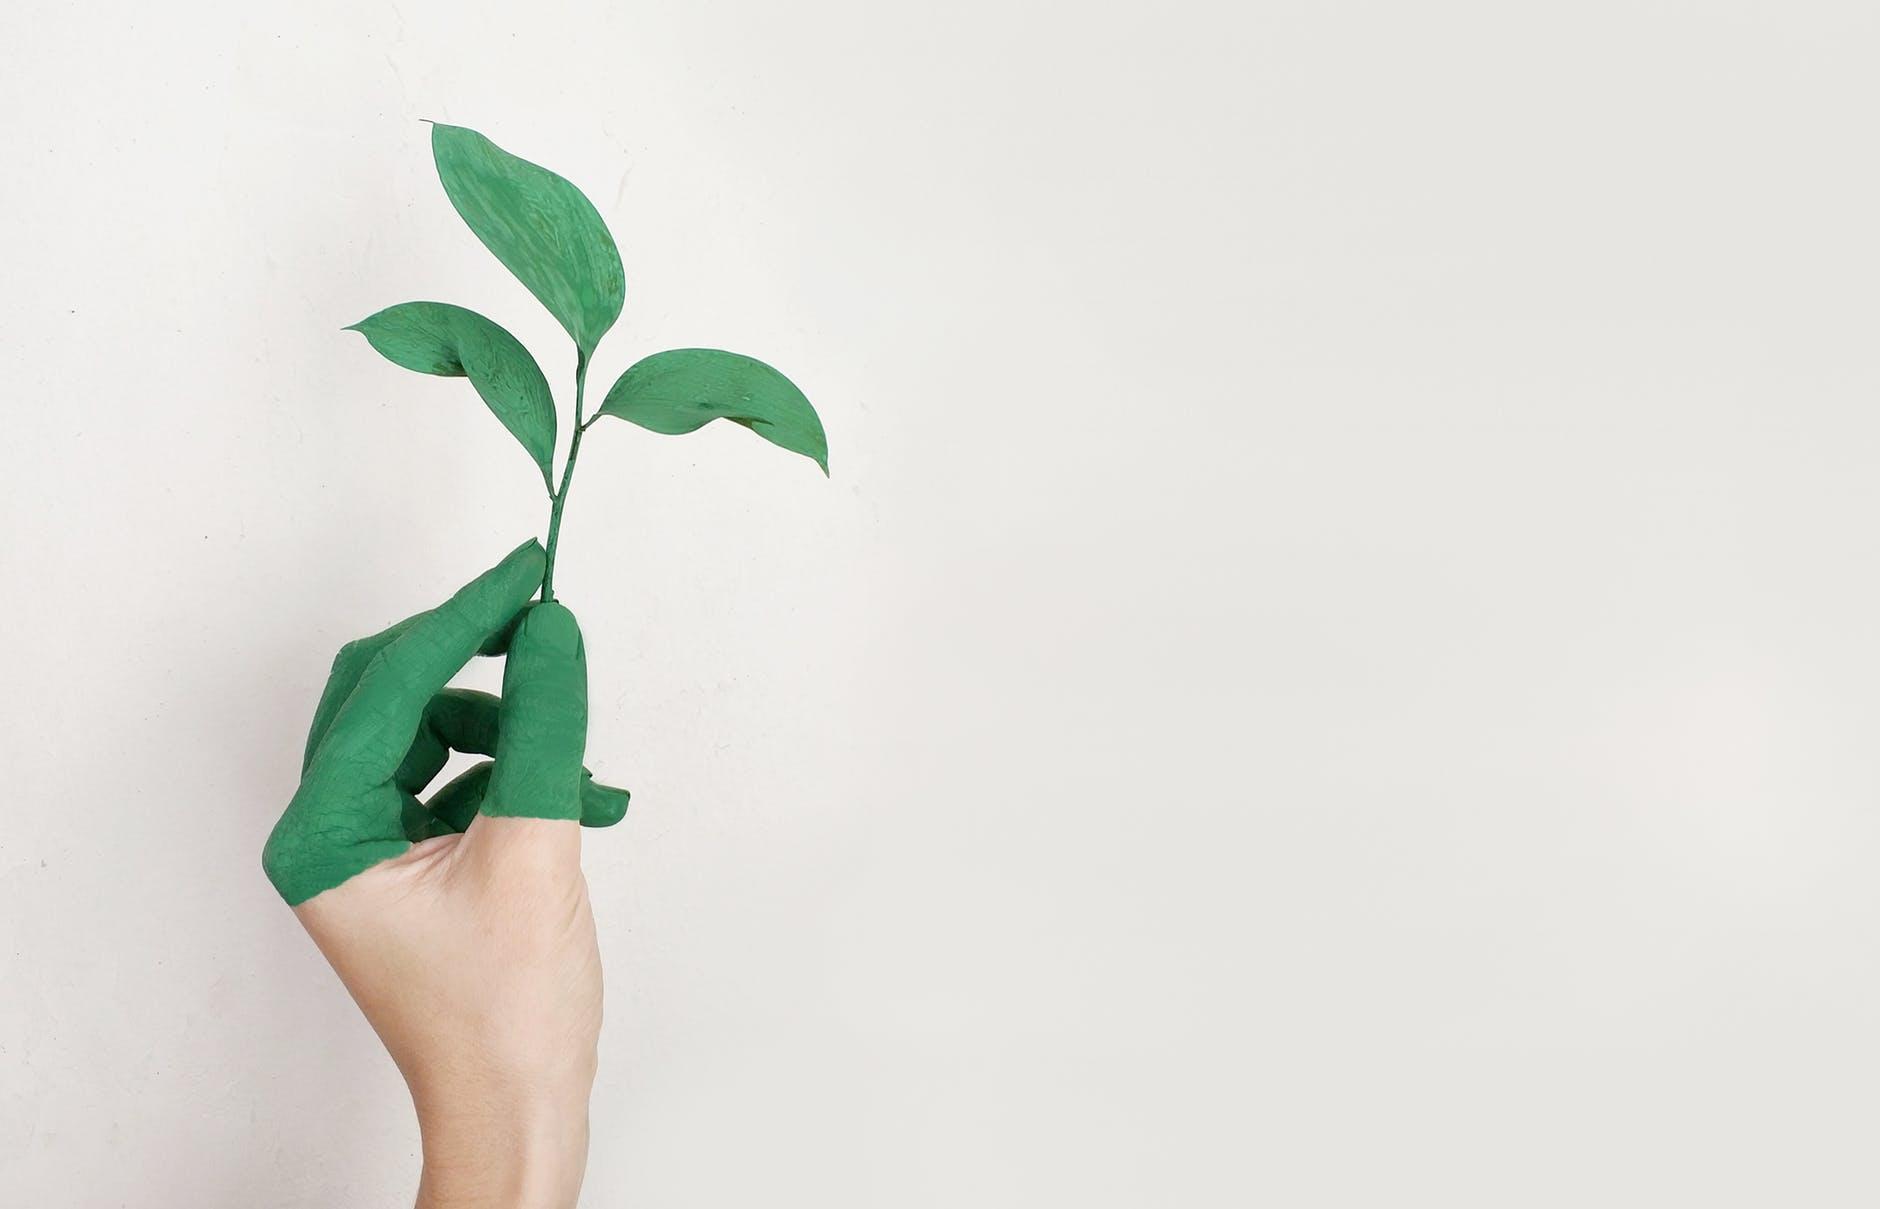 greenwashing unilever 2